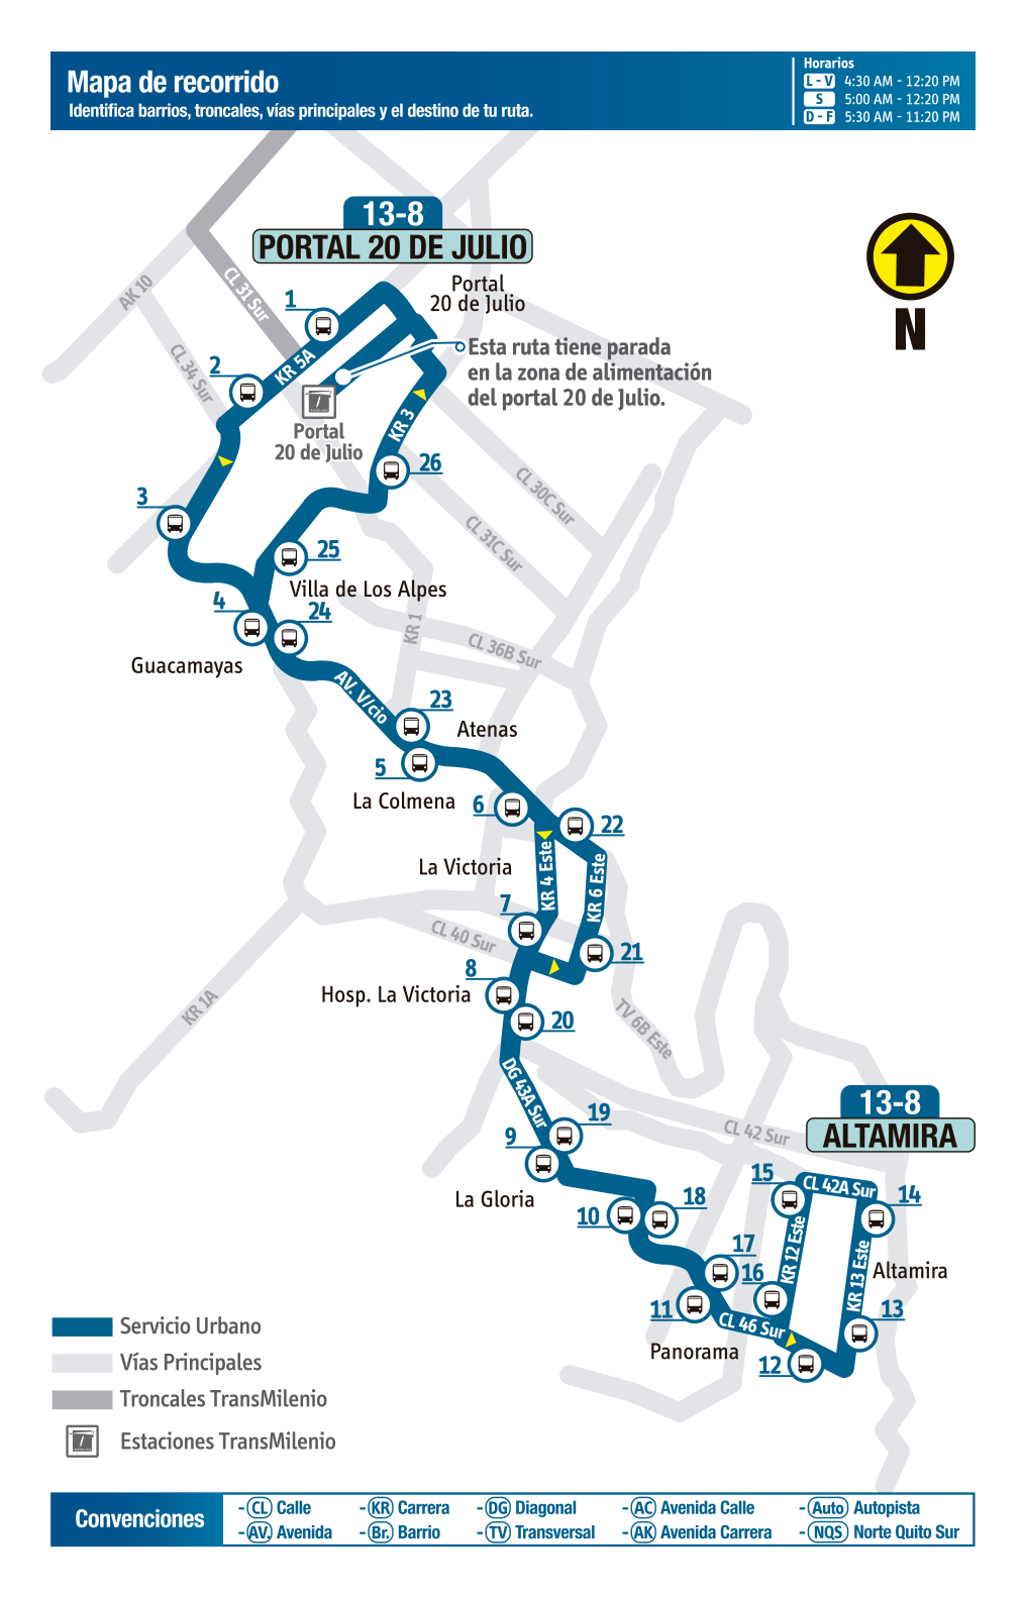 Ruta SITP: 13-8 Portal 20 de Julio ↔ Altamira [Urbana] (mapa)